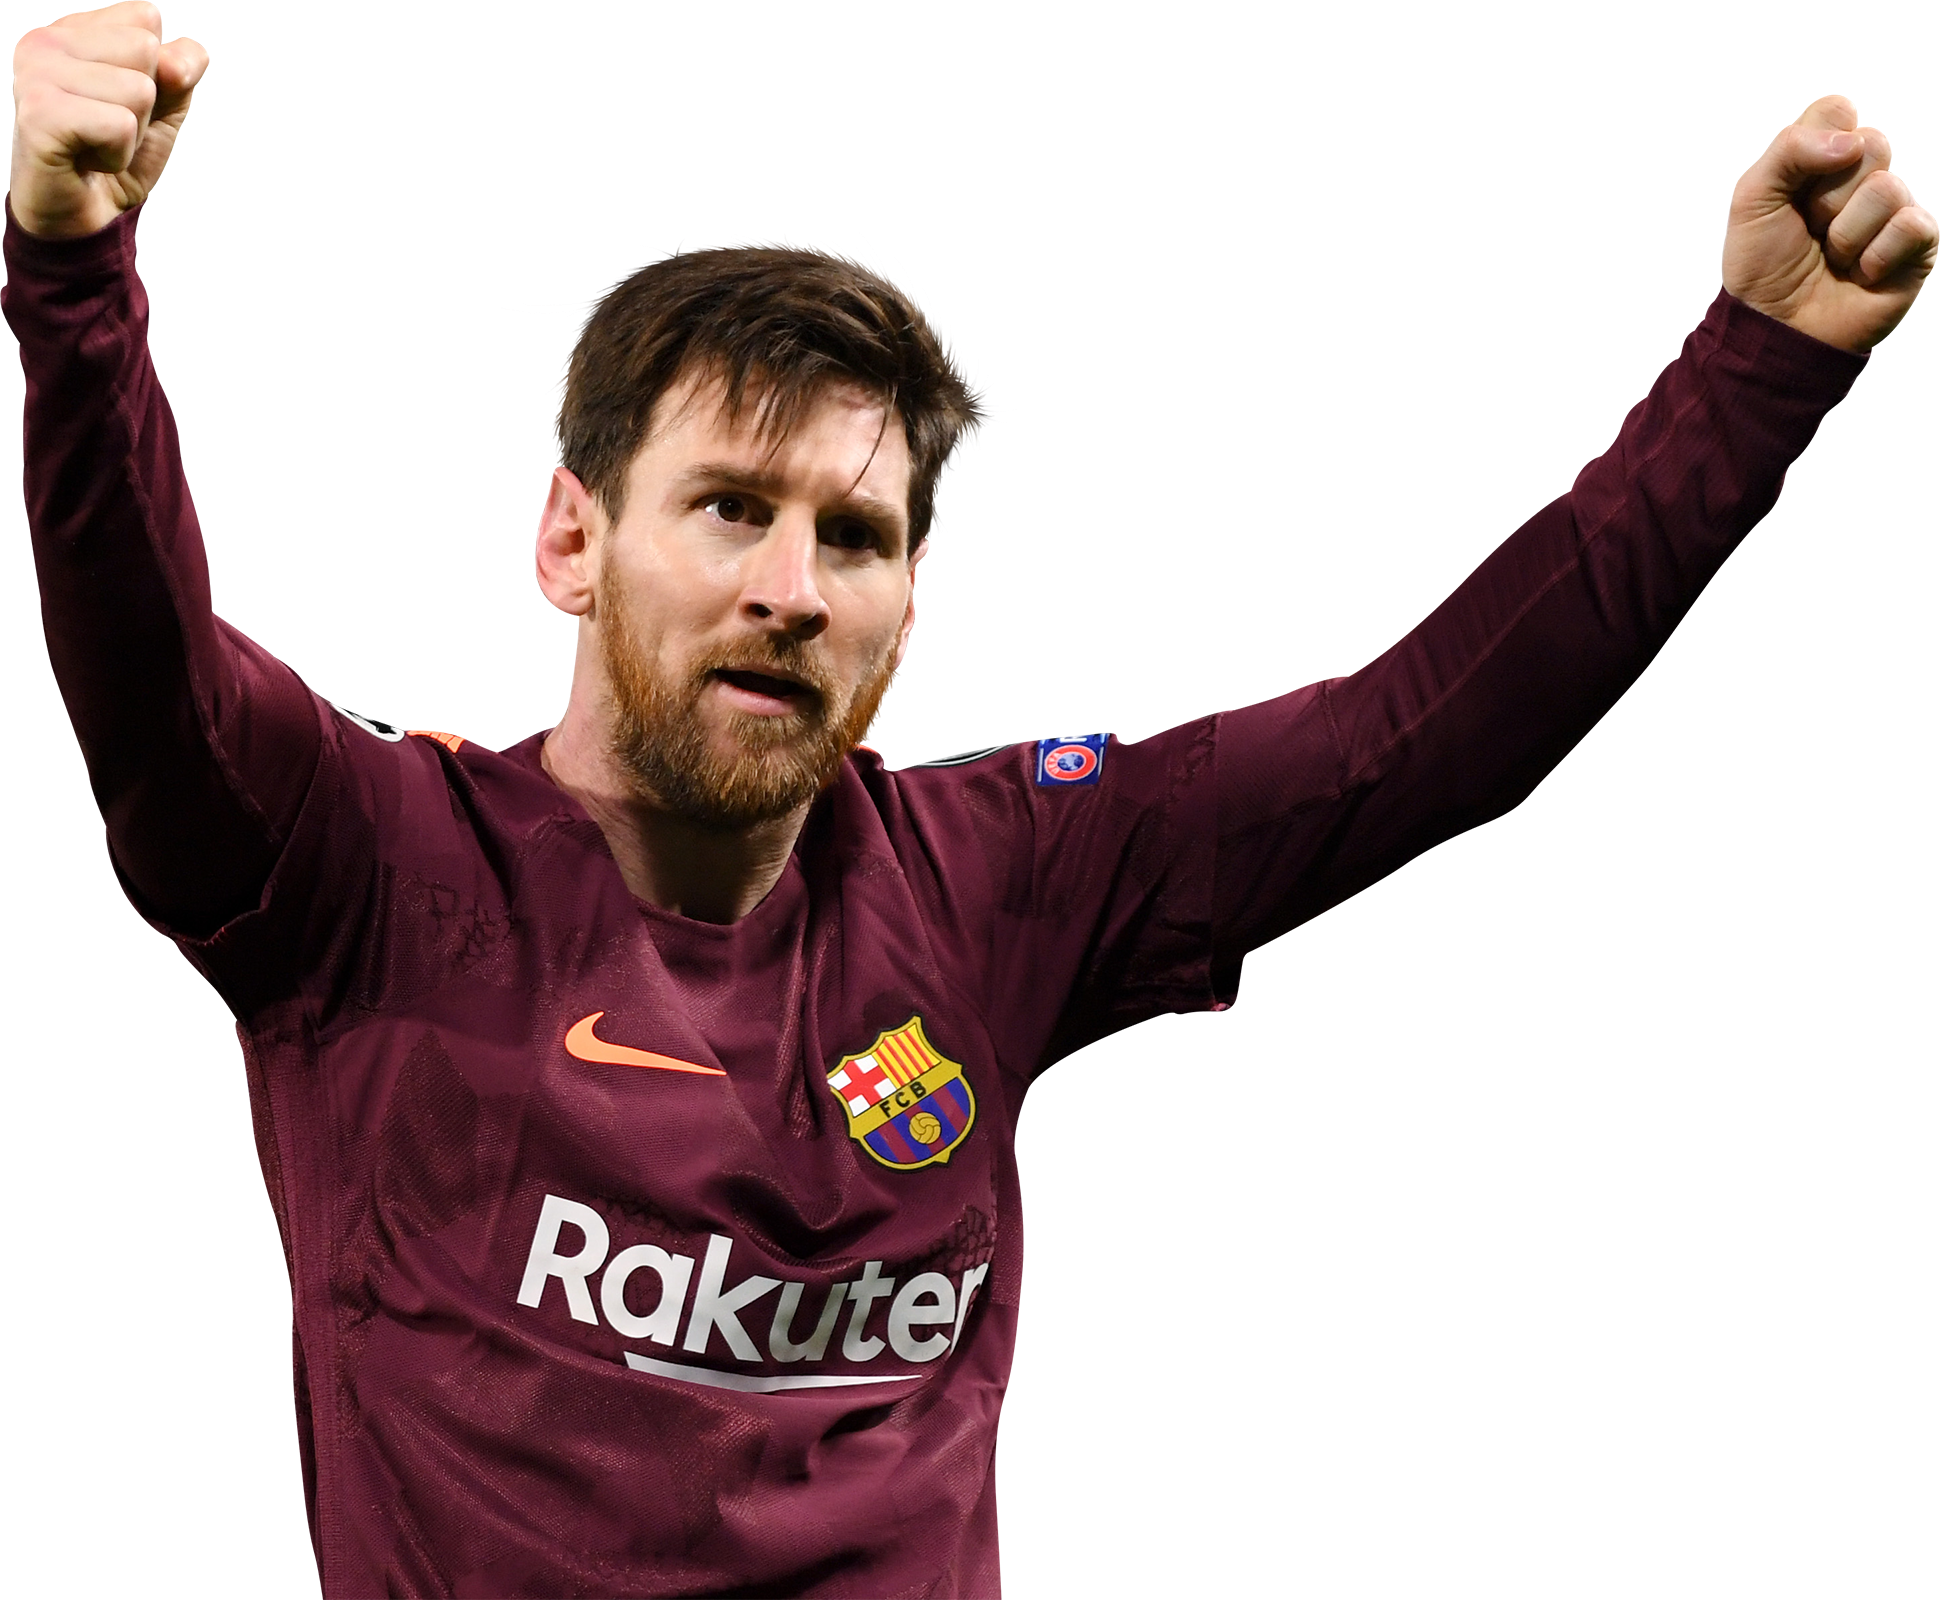 Messi 2018 clipart banner Lionel Messi 2018 Png Nike Rakuten banner